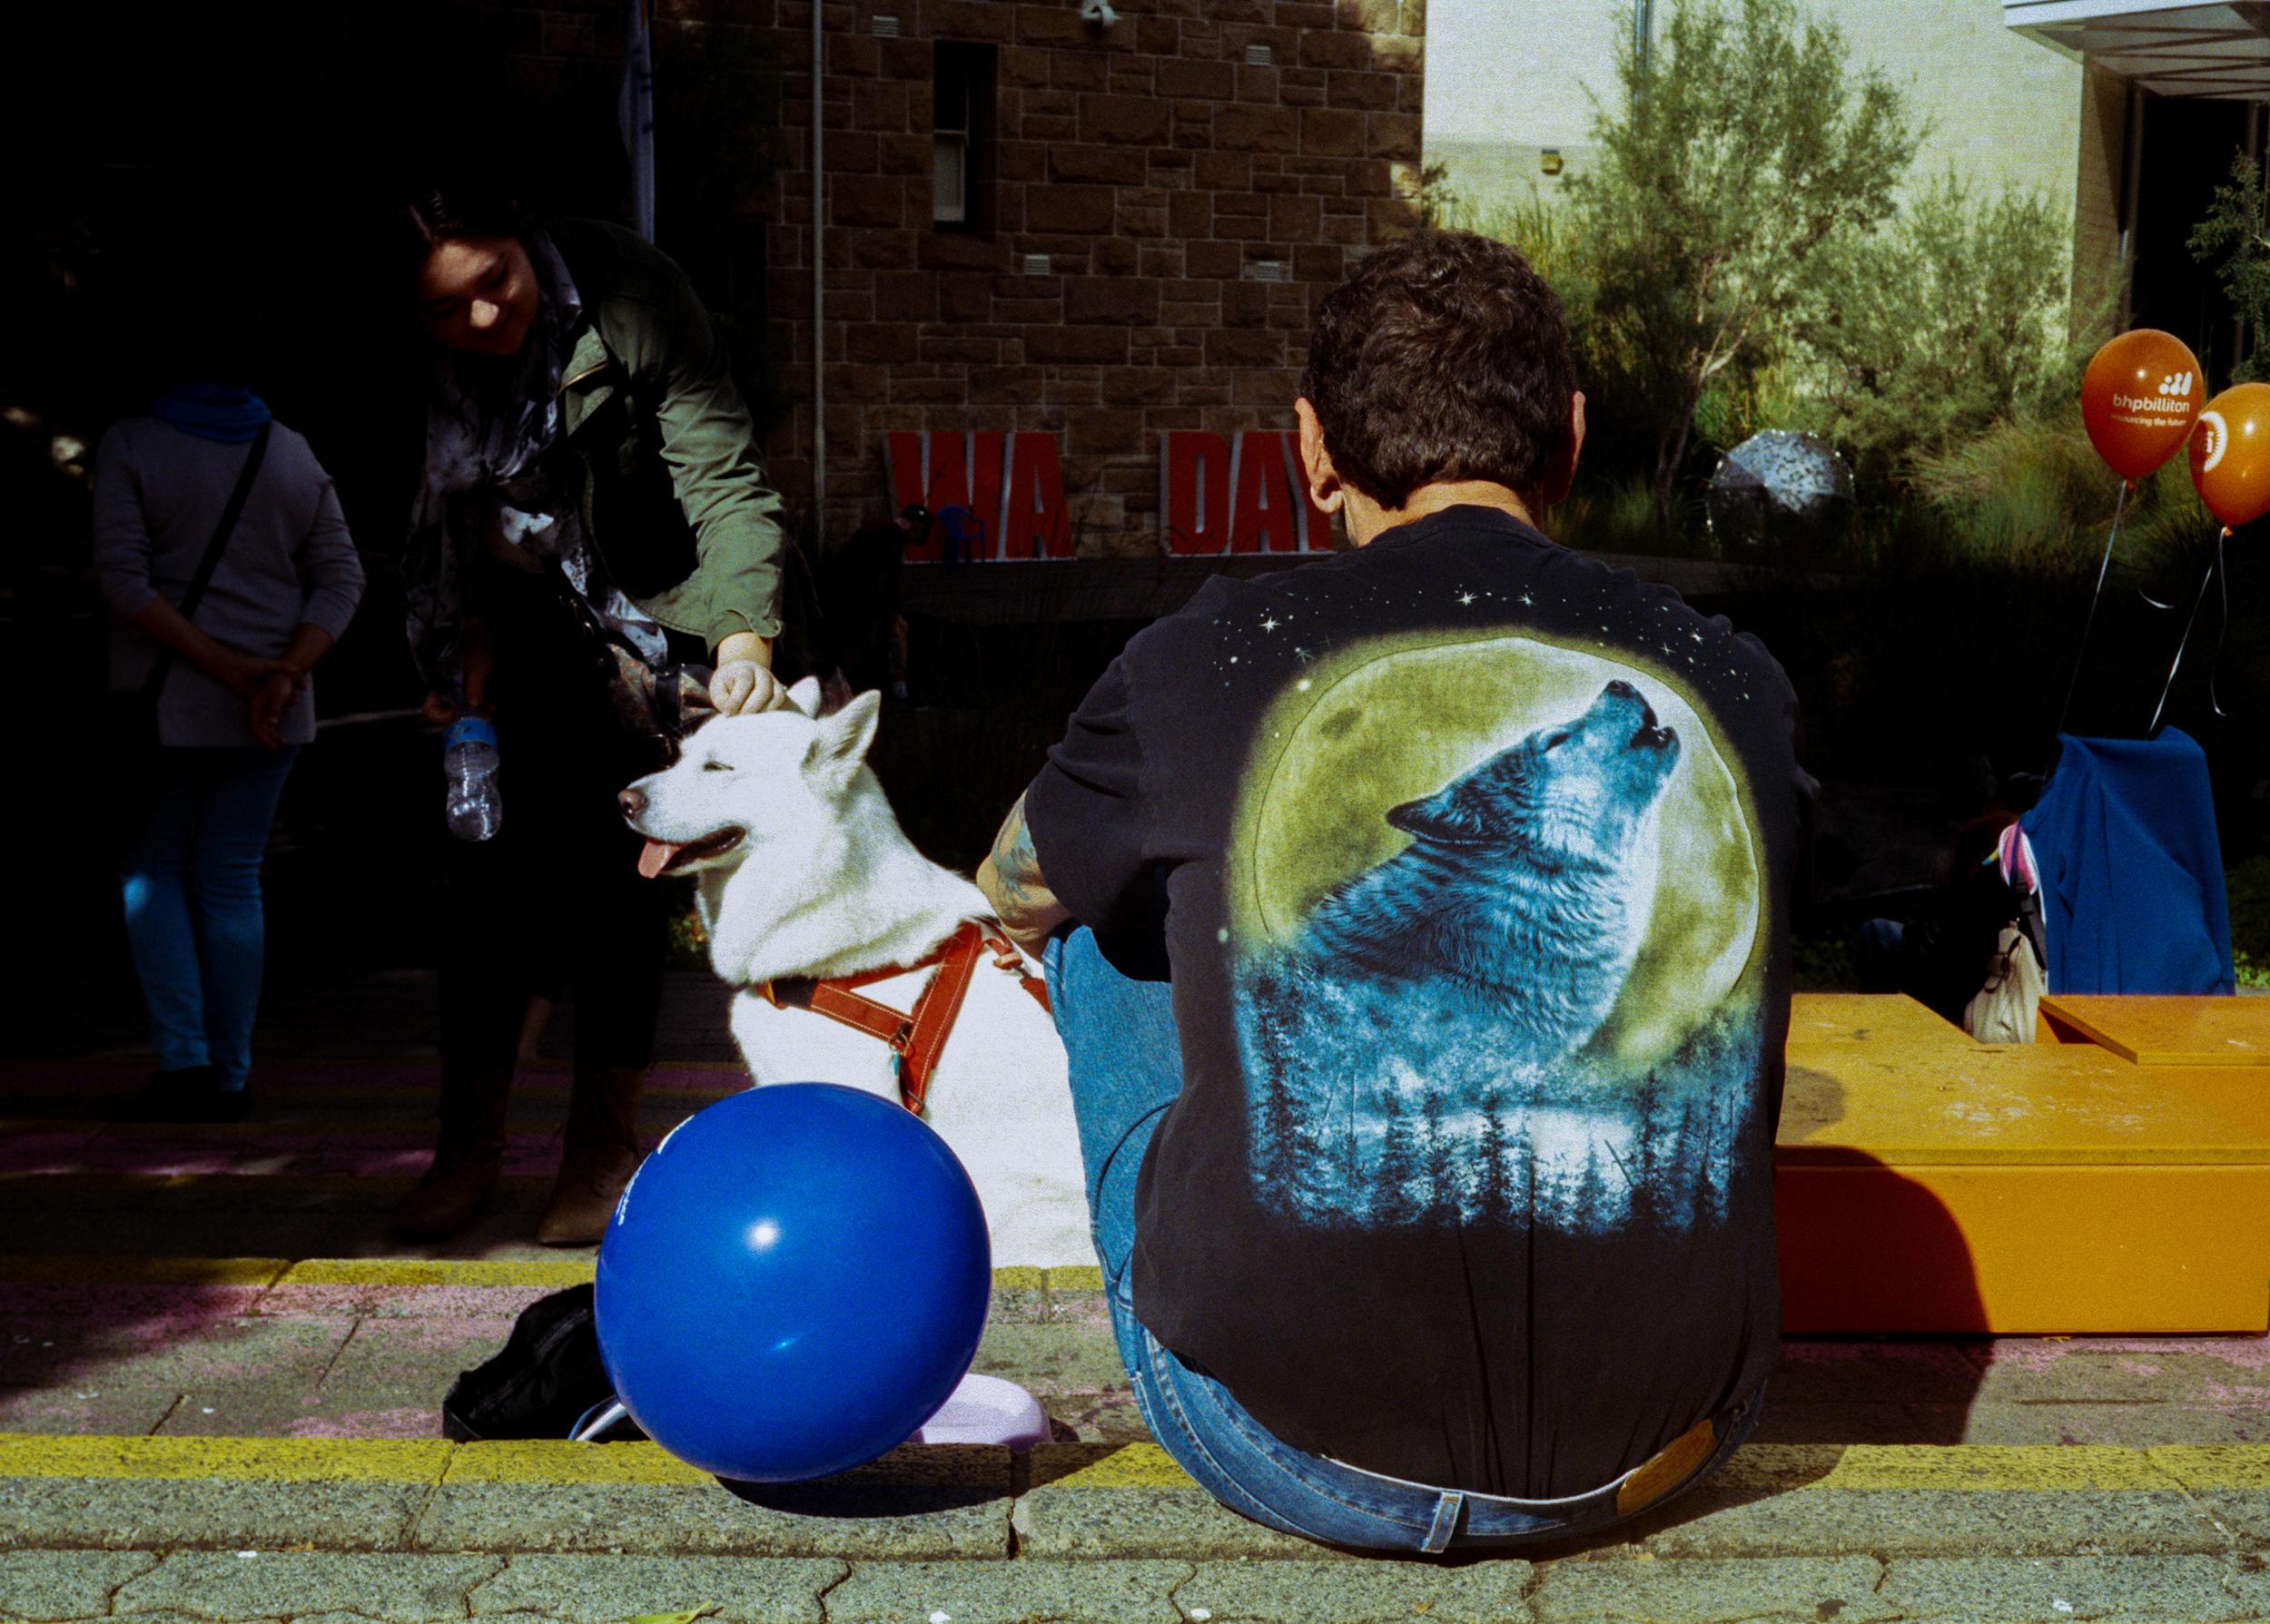 justin_tan_torres_australian_street_photography_dog_wolf_WA_day_2014_03.jpg